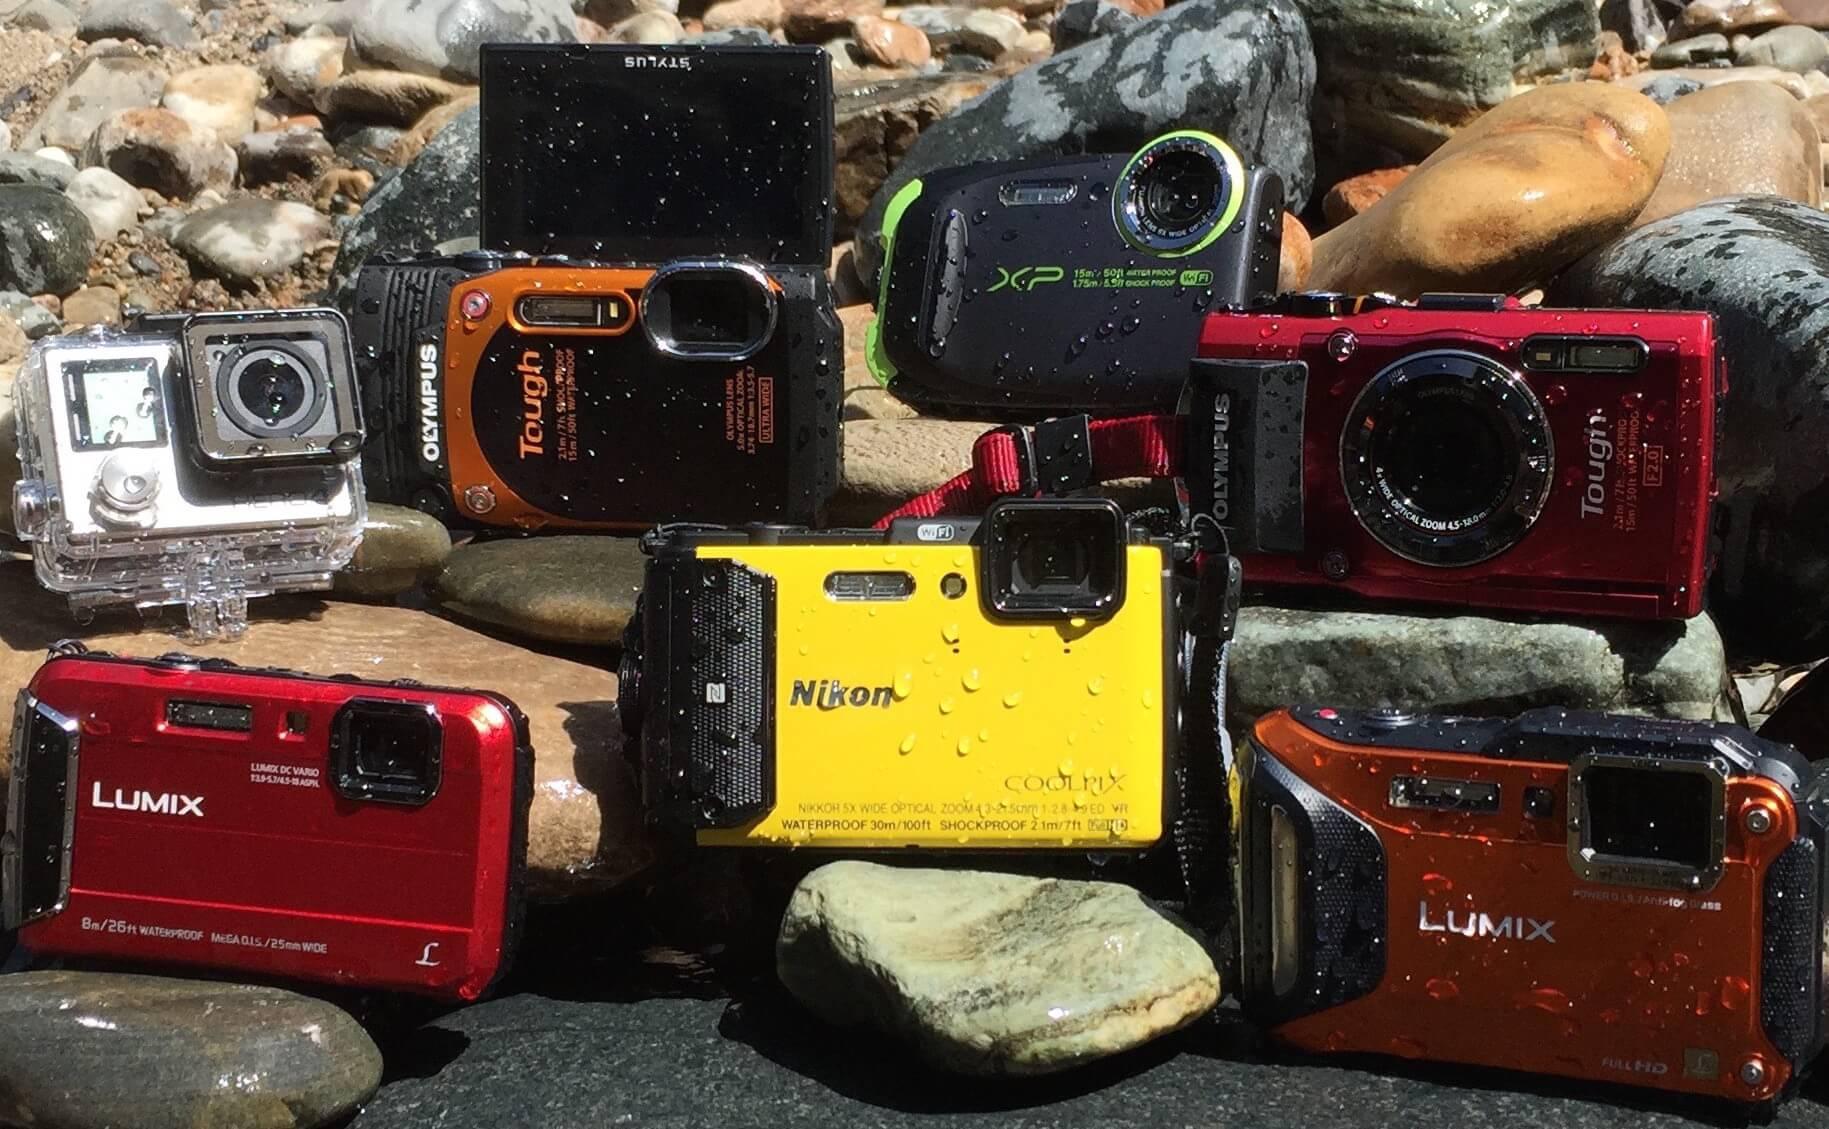 Top 8 Waterproof Cameras For Rugged Adventure 2016